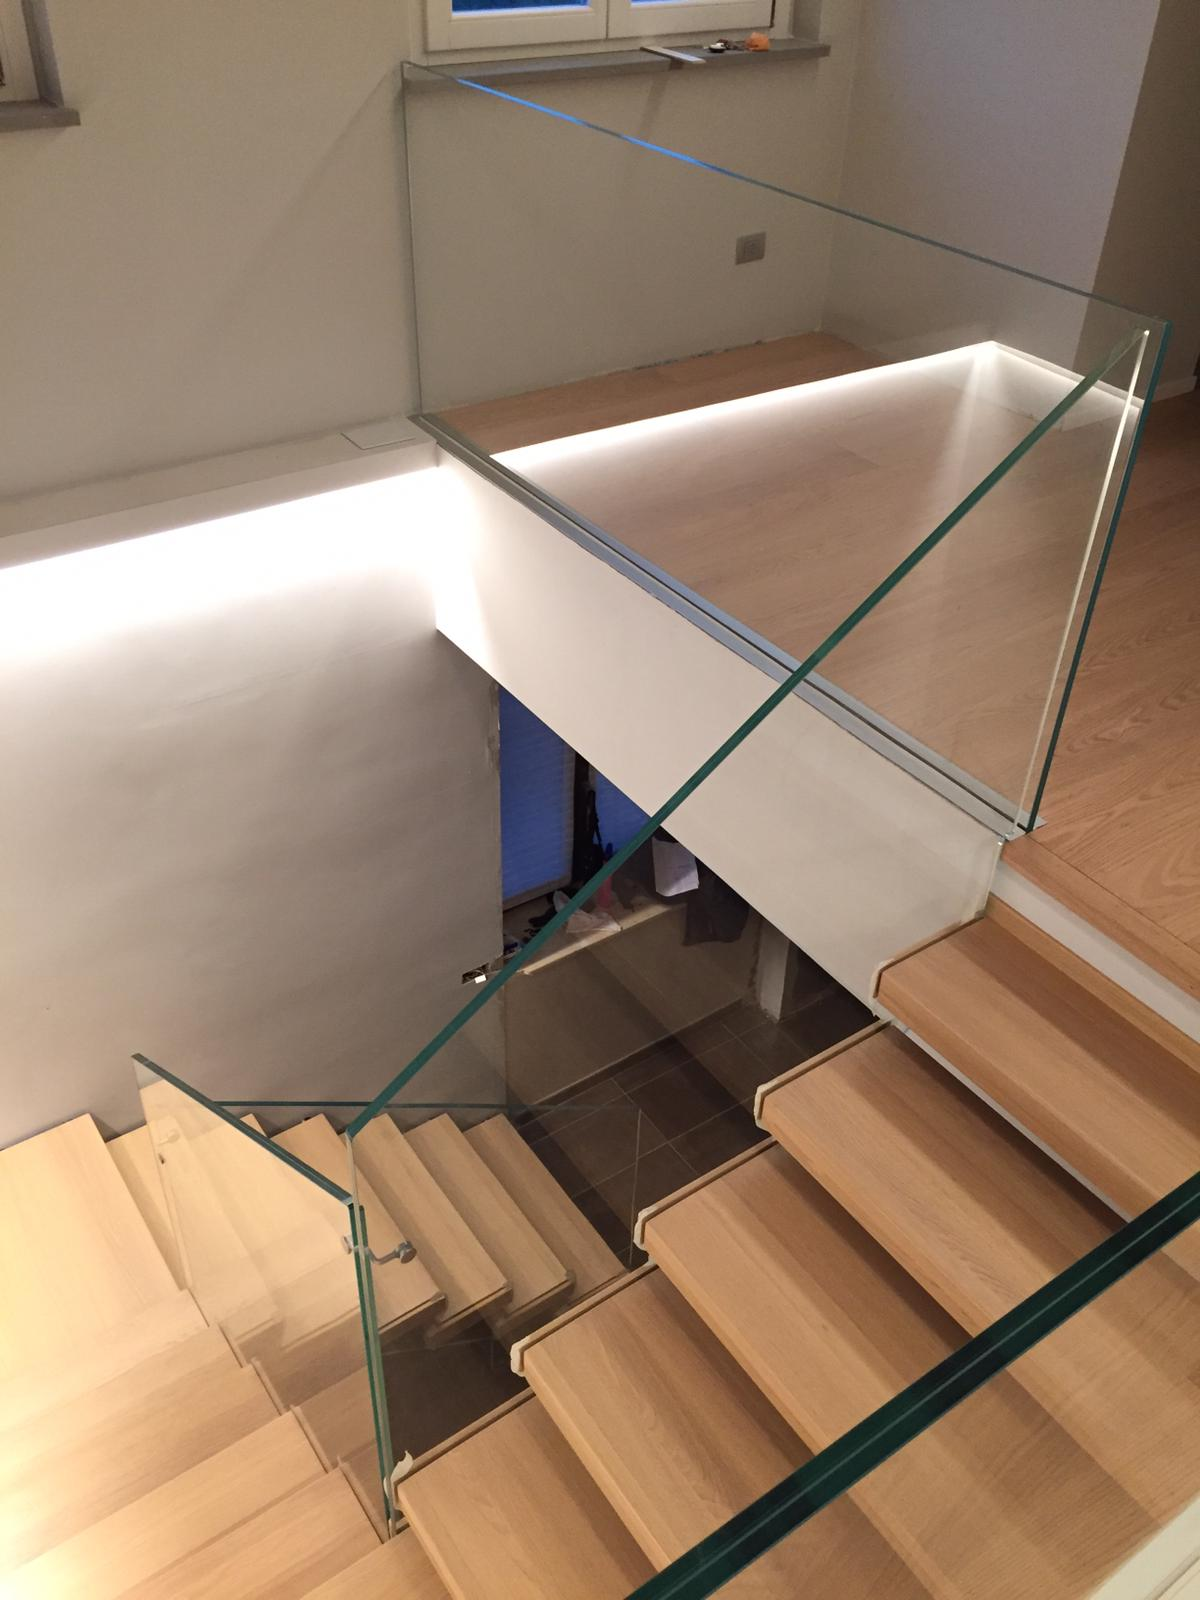 sbalzo legno vetro 11 part 2